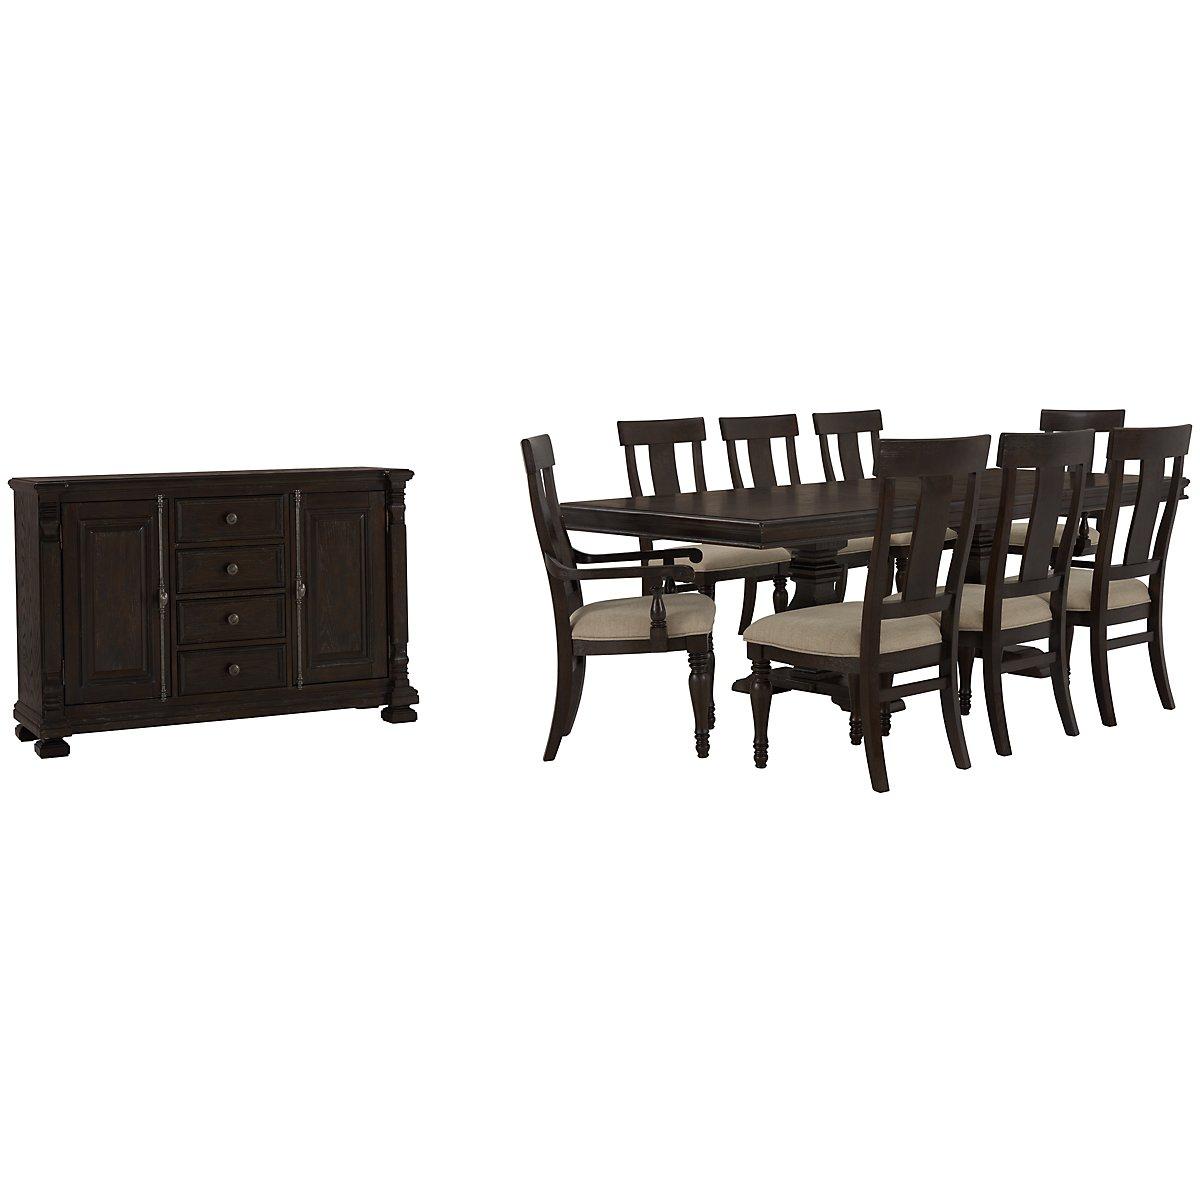 Sterling Dark Tone Wood Side Chair. City Furniture  Sterling Dark Tone Wood Side Chair